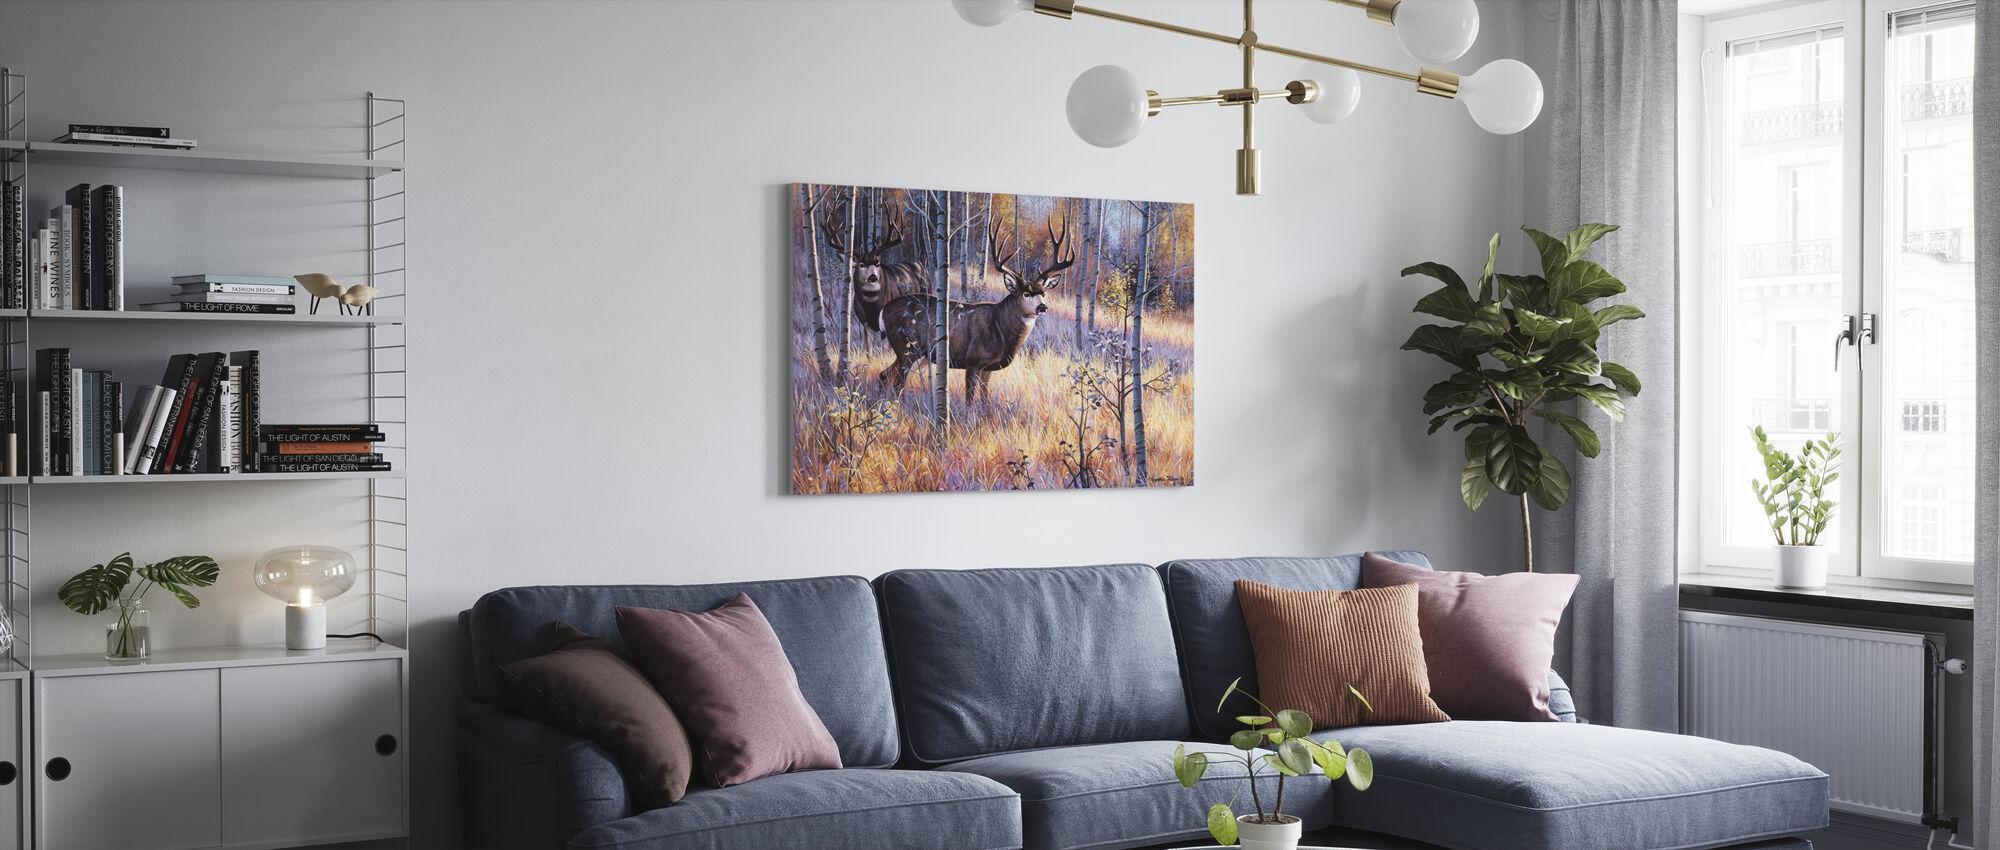 The Elusive Ones - Canvas print - Living Room